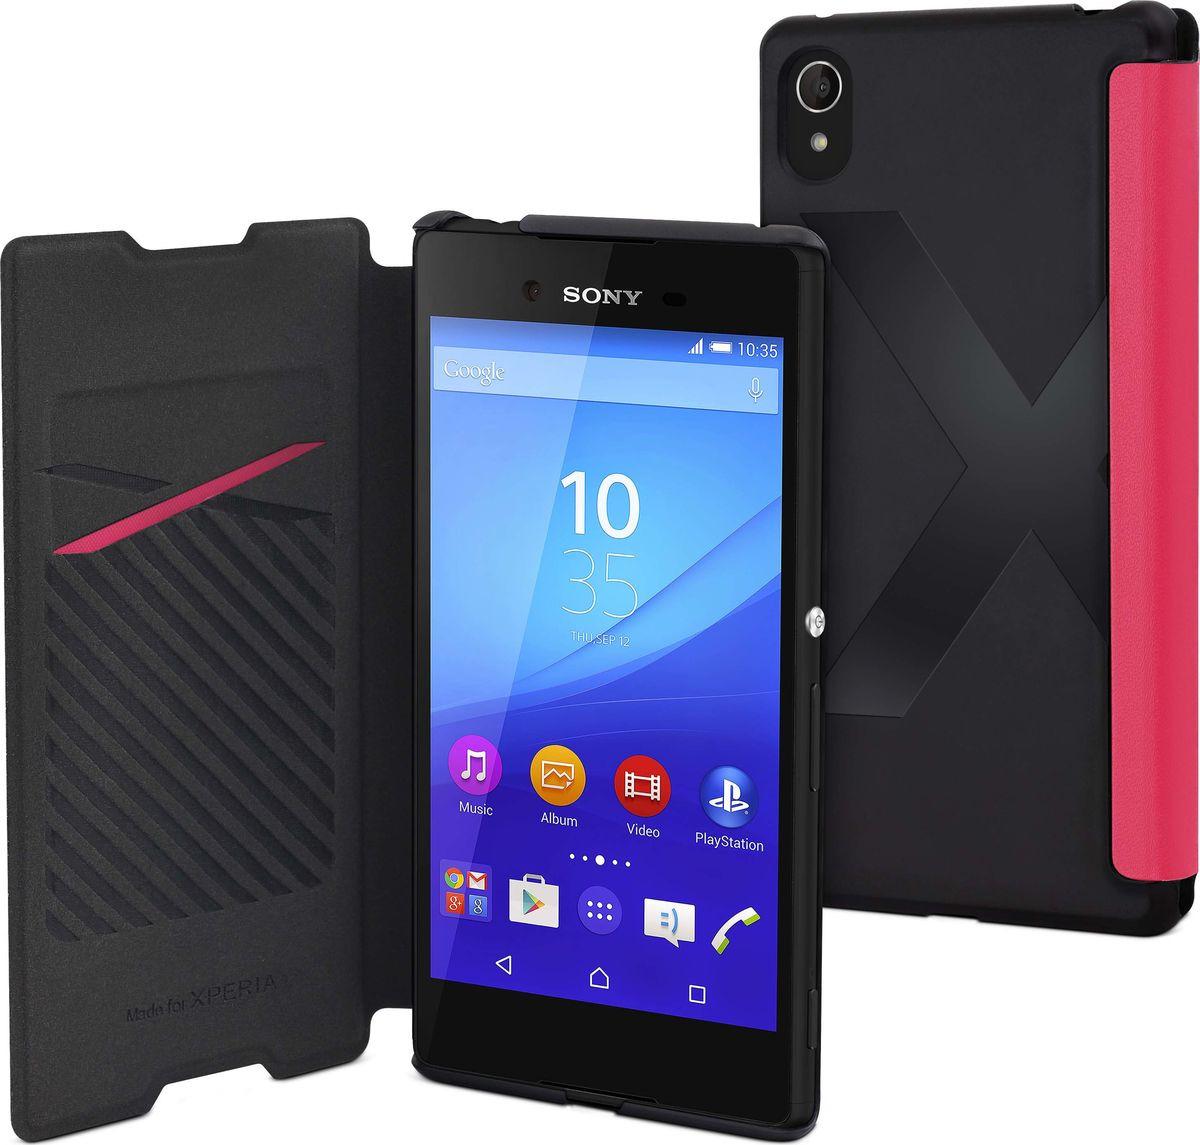 Чехол для сотового телефона Muvit MFX Easy Folio Case для Sony Xperia Z3+, SEEAF0033, розовый чехол для sony f8331 f8332 xperia xz skinbox lux case черный